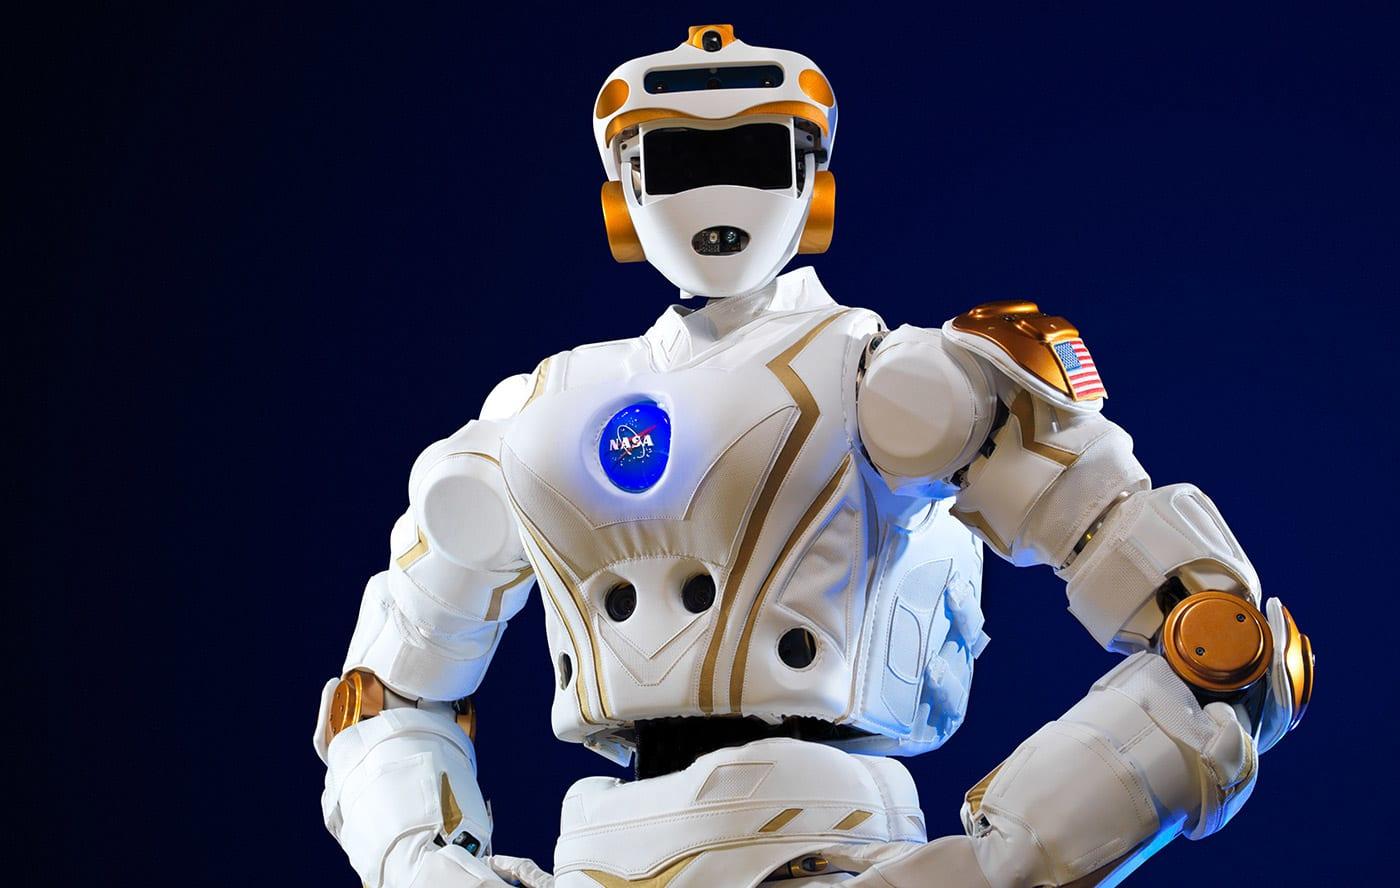 NASA's $1 million robotics contest will prep Valkyrie for Mars